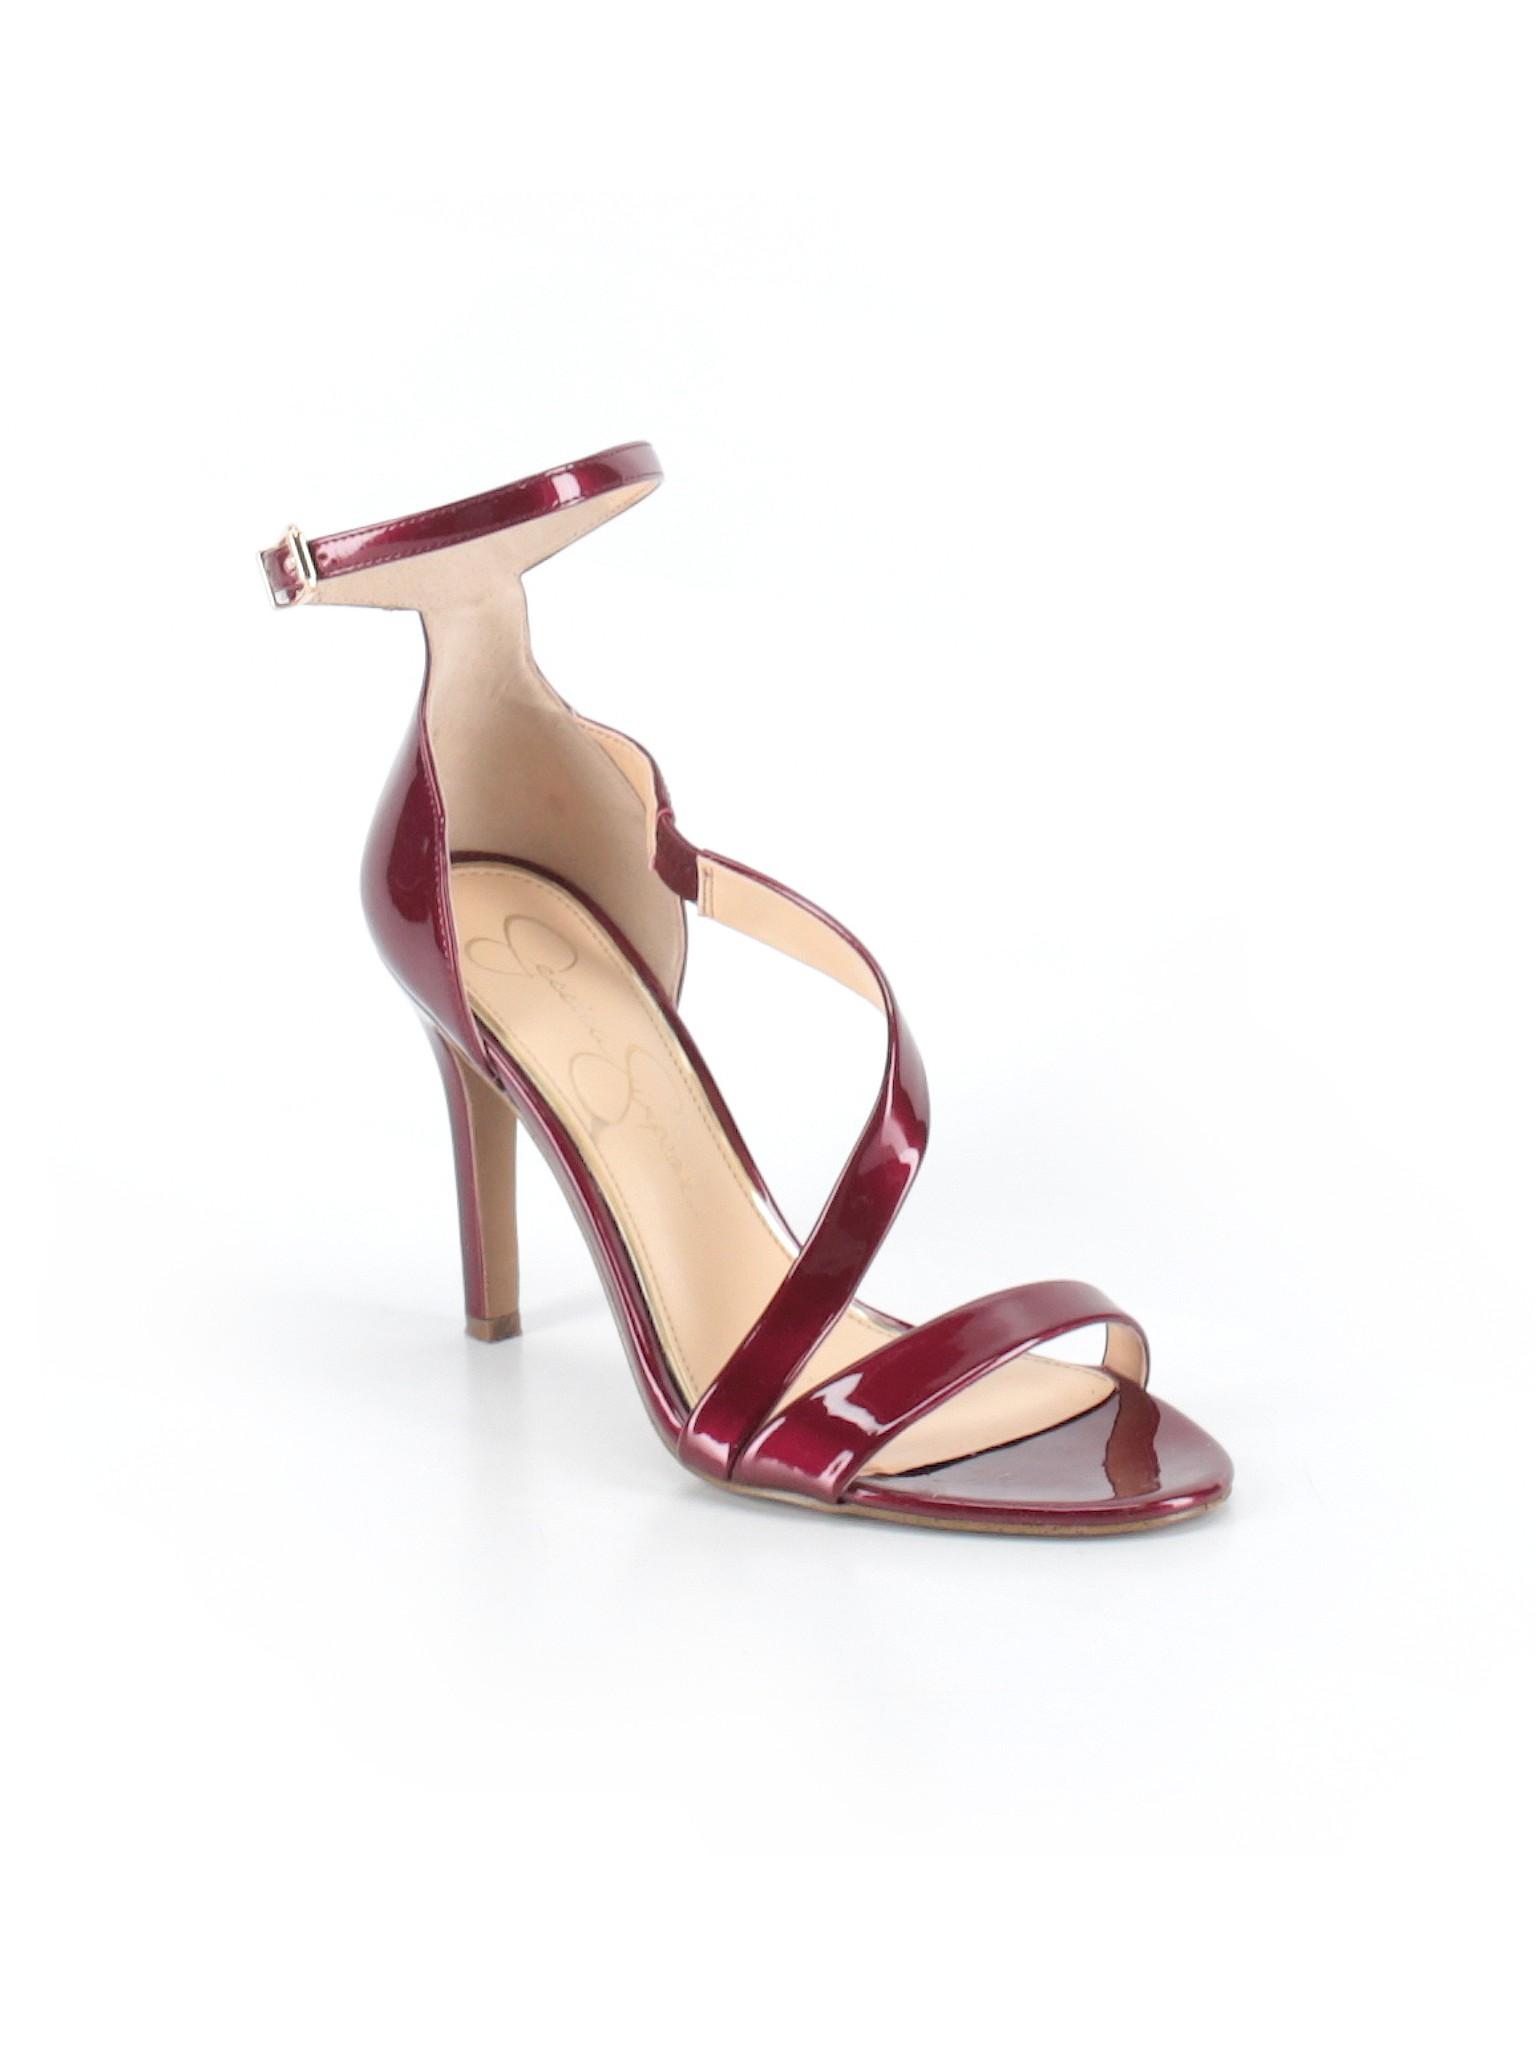 promotion Boutique Jessica Simpson Heels Jessica Simpson Boutique promotion Heels Boutique 6H55qdr7n